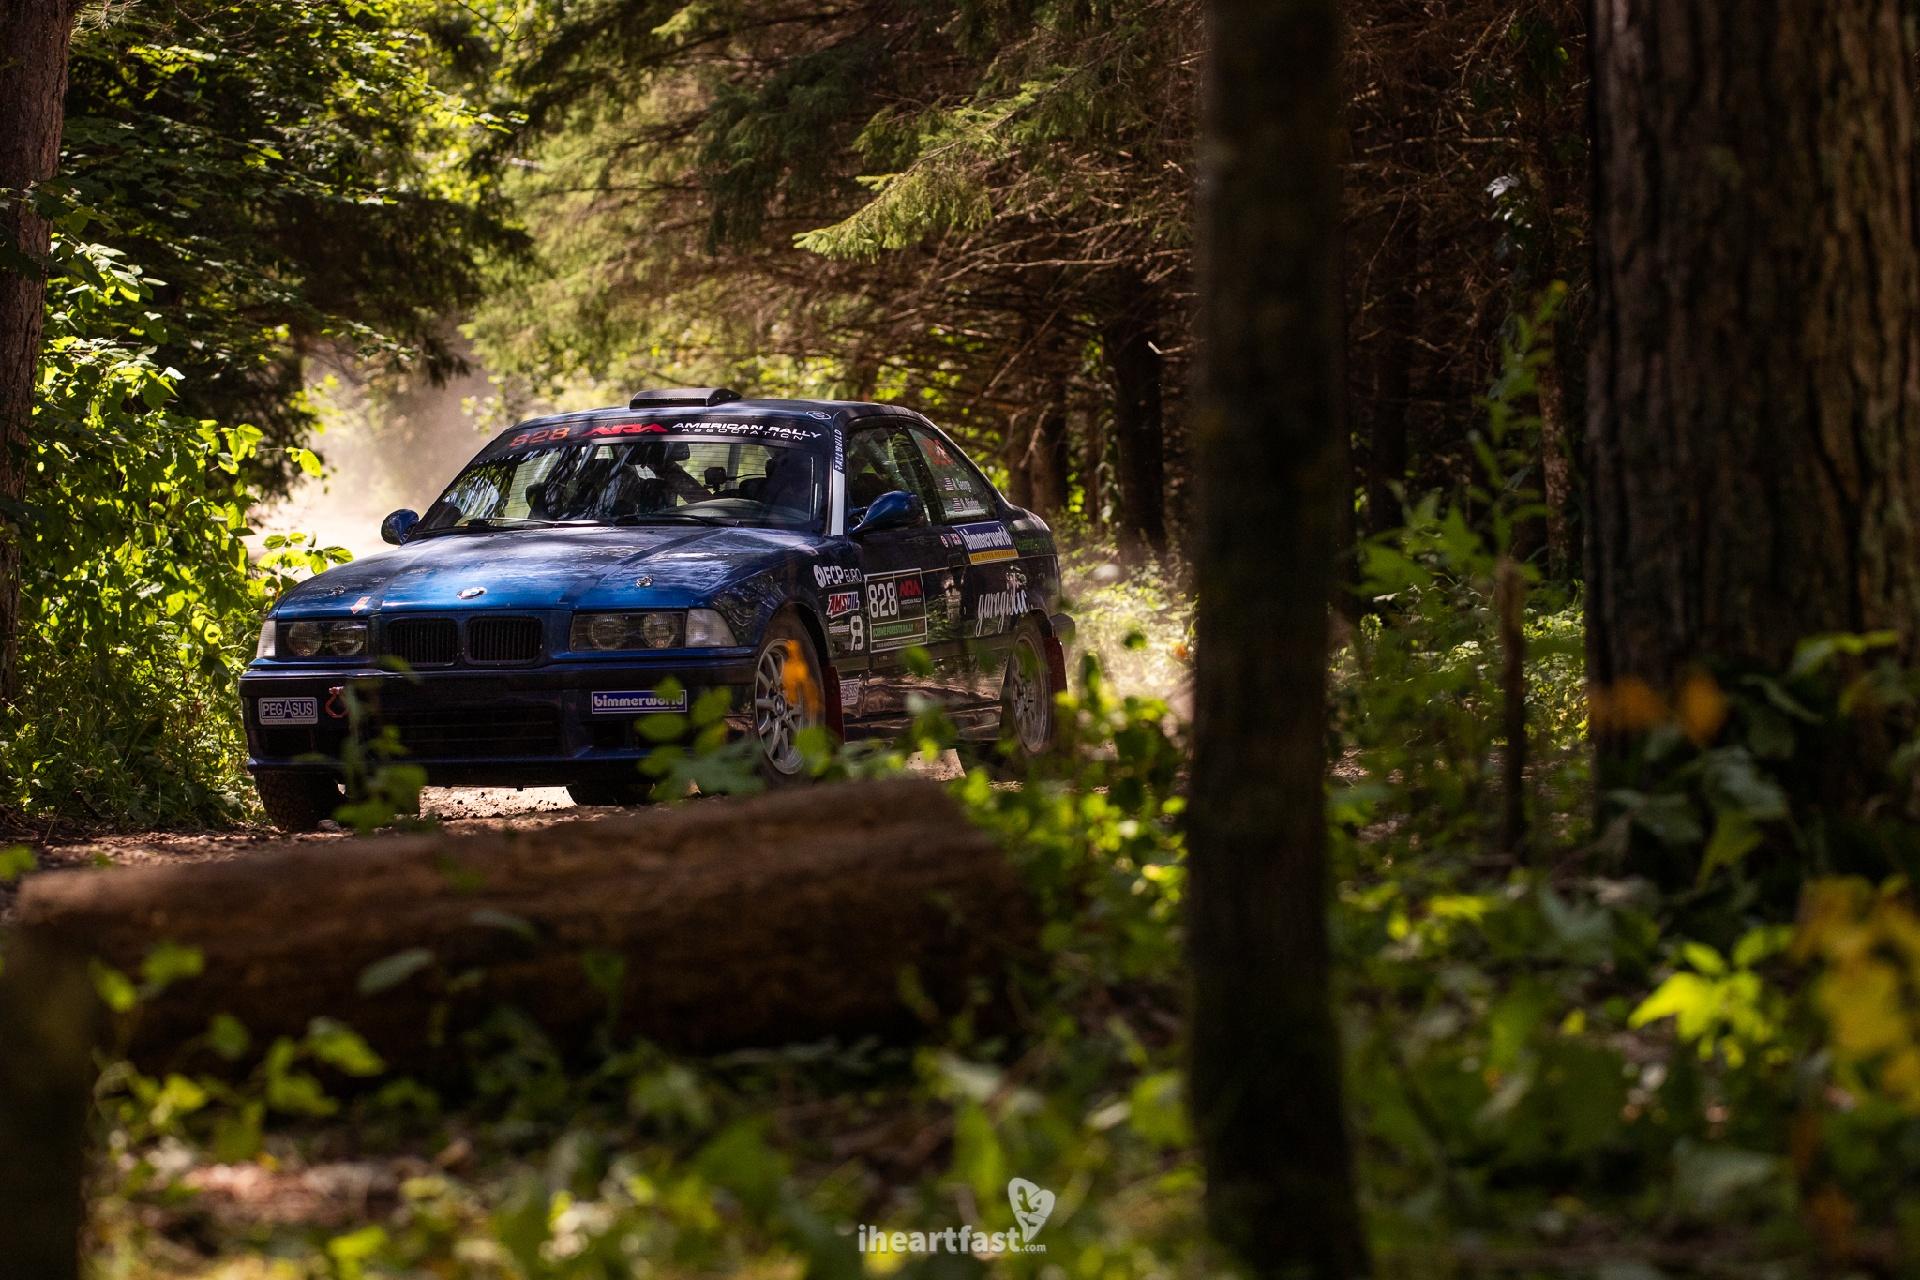 Bearded Ryno Rally Team Rally Car Ojibwe Forest Rally